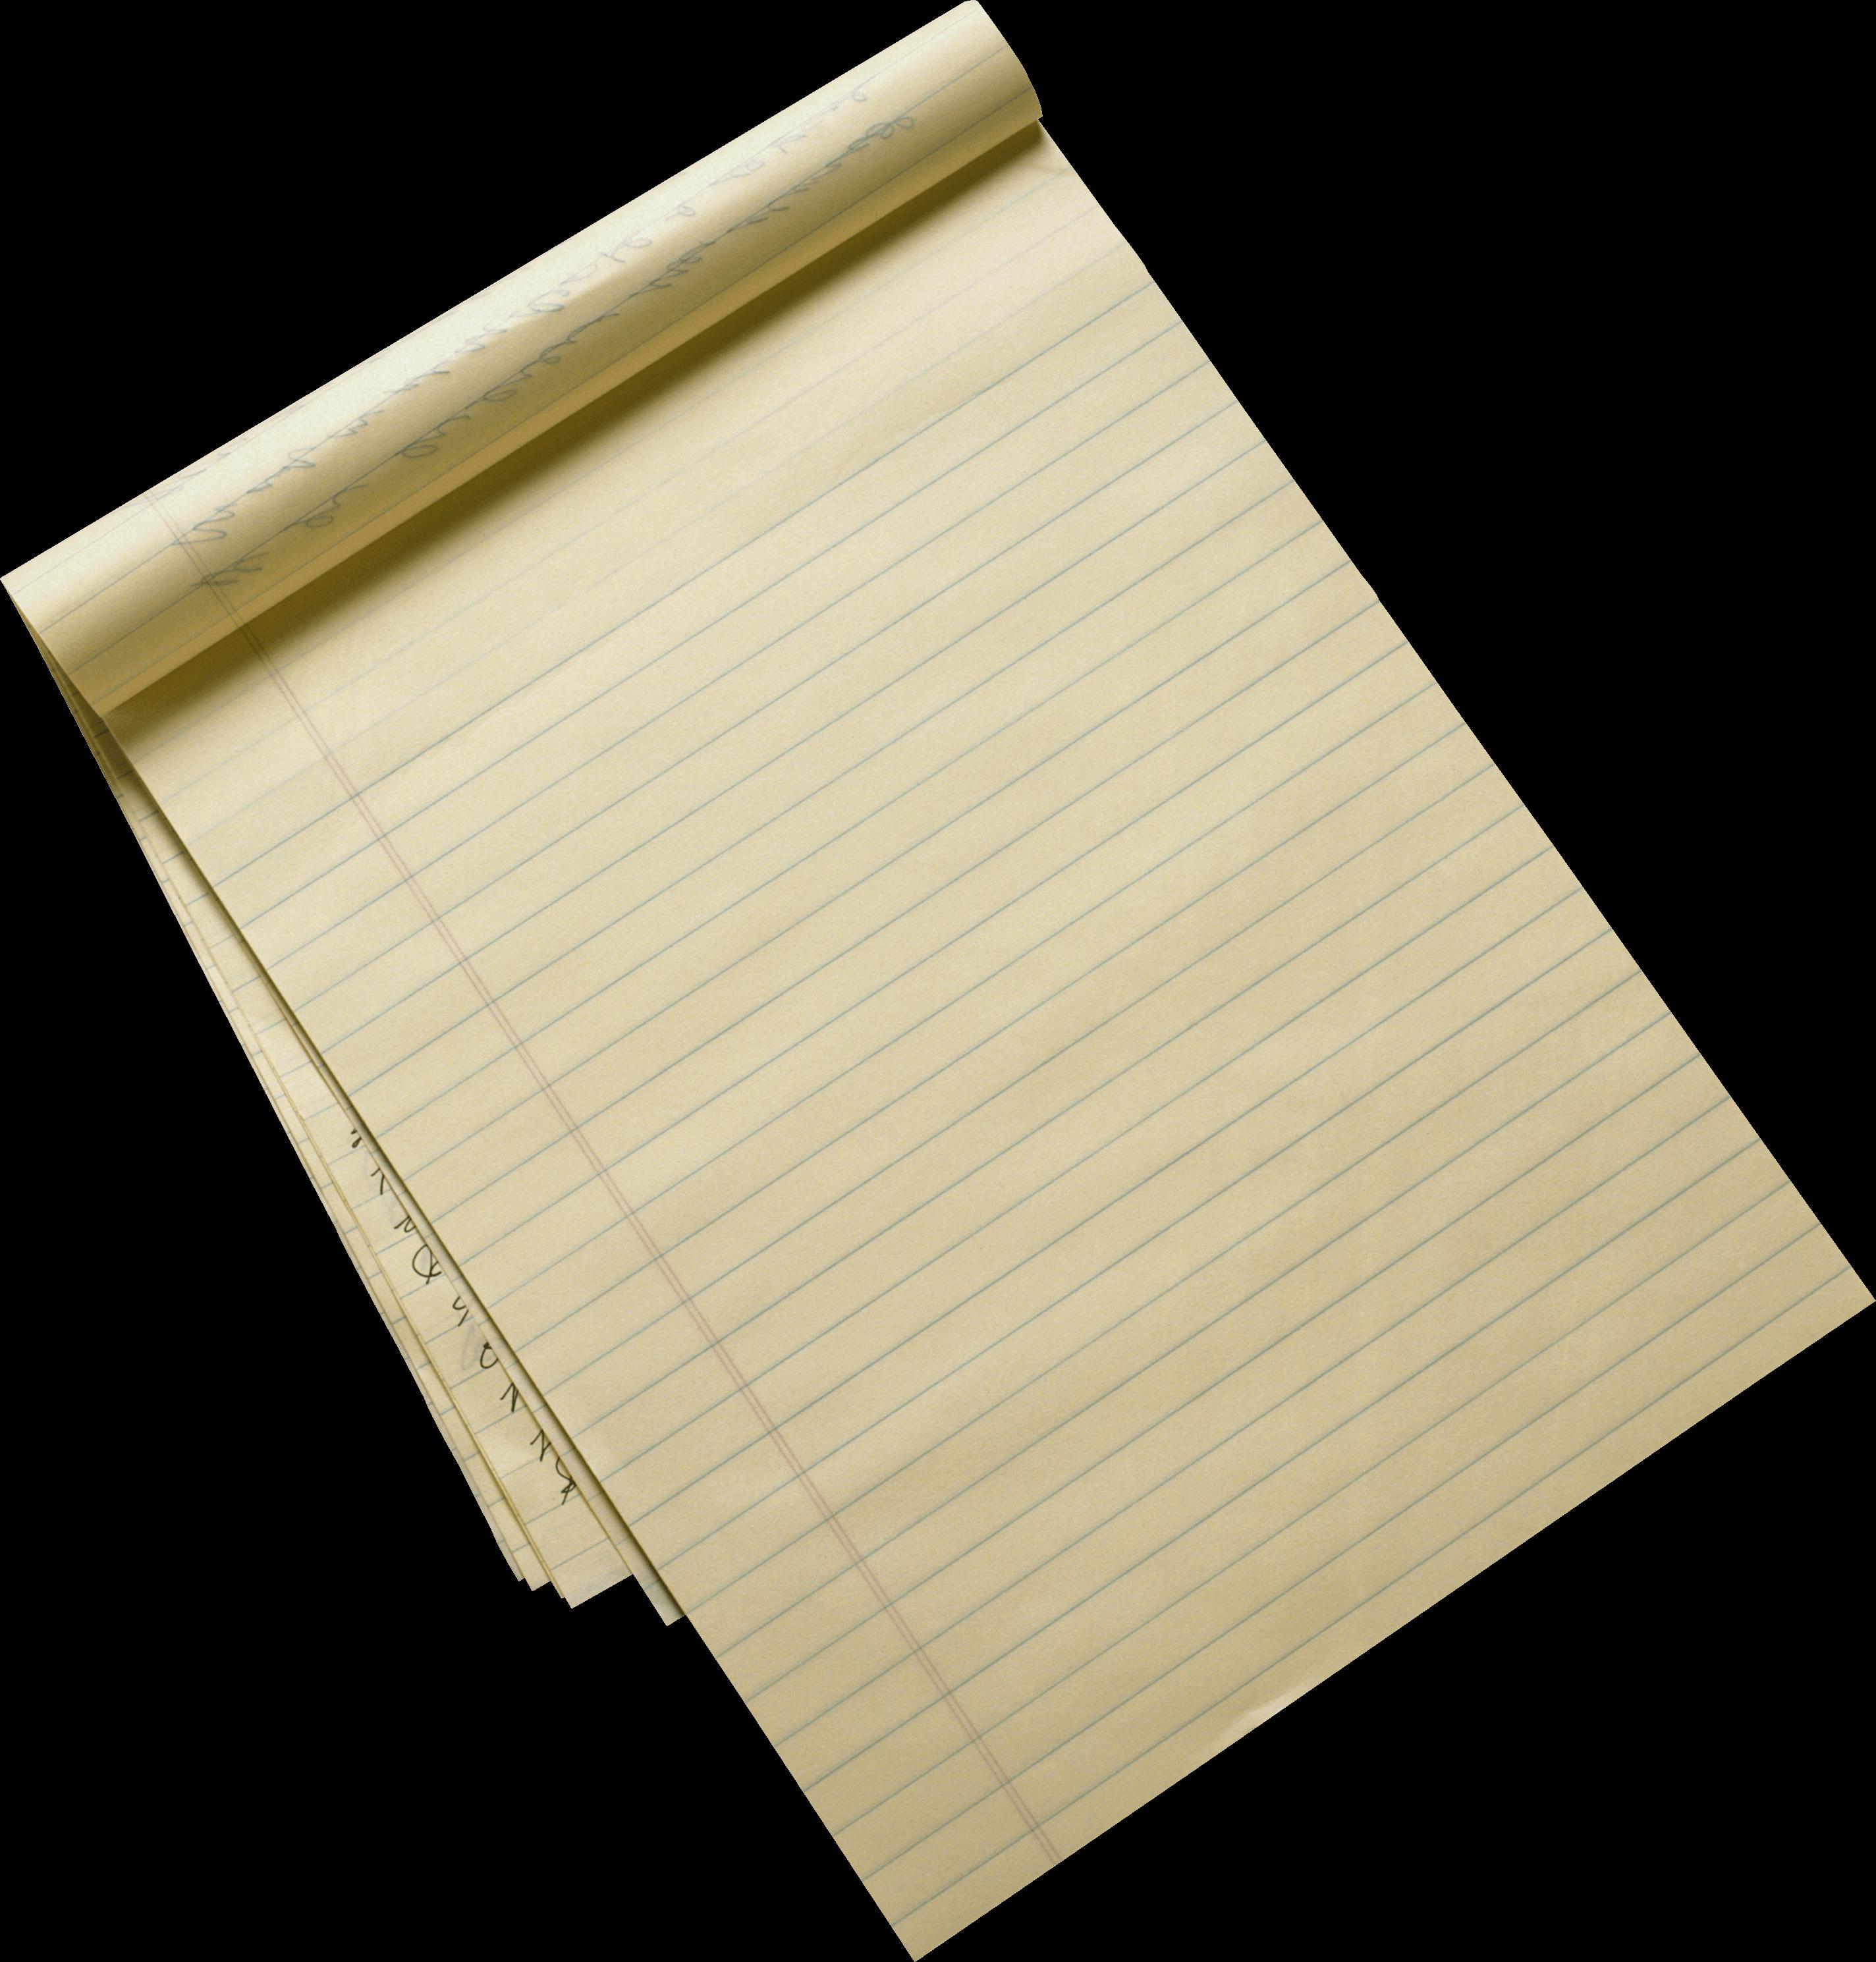 Paper Sheet PNG